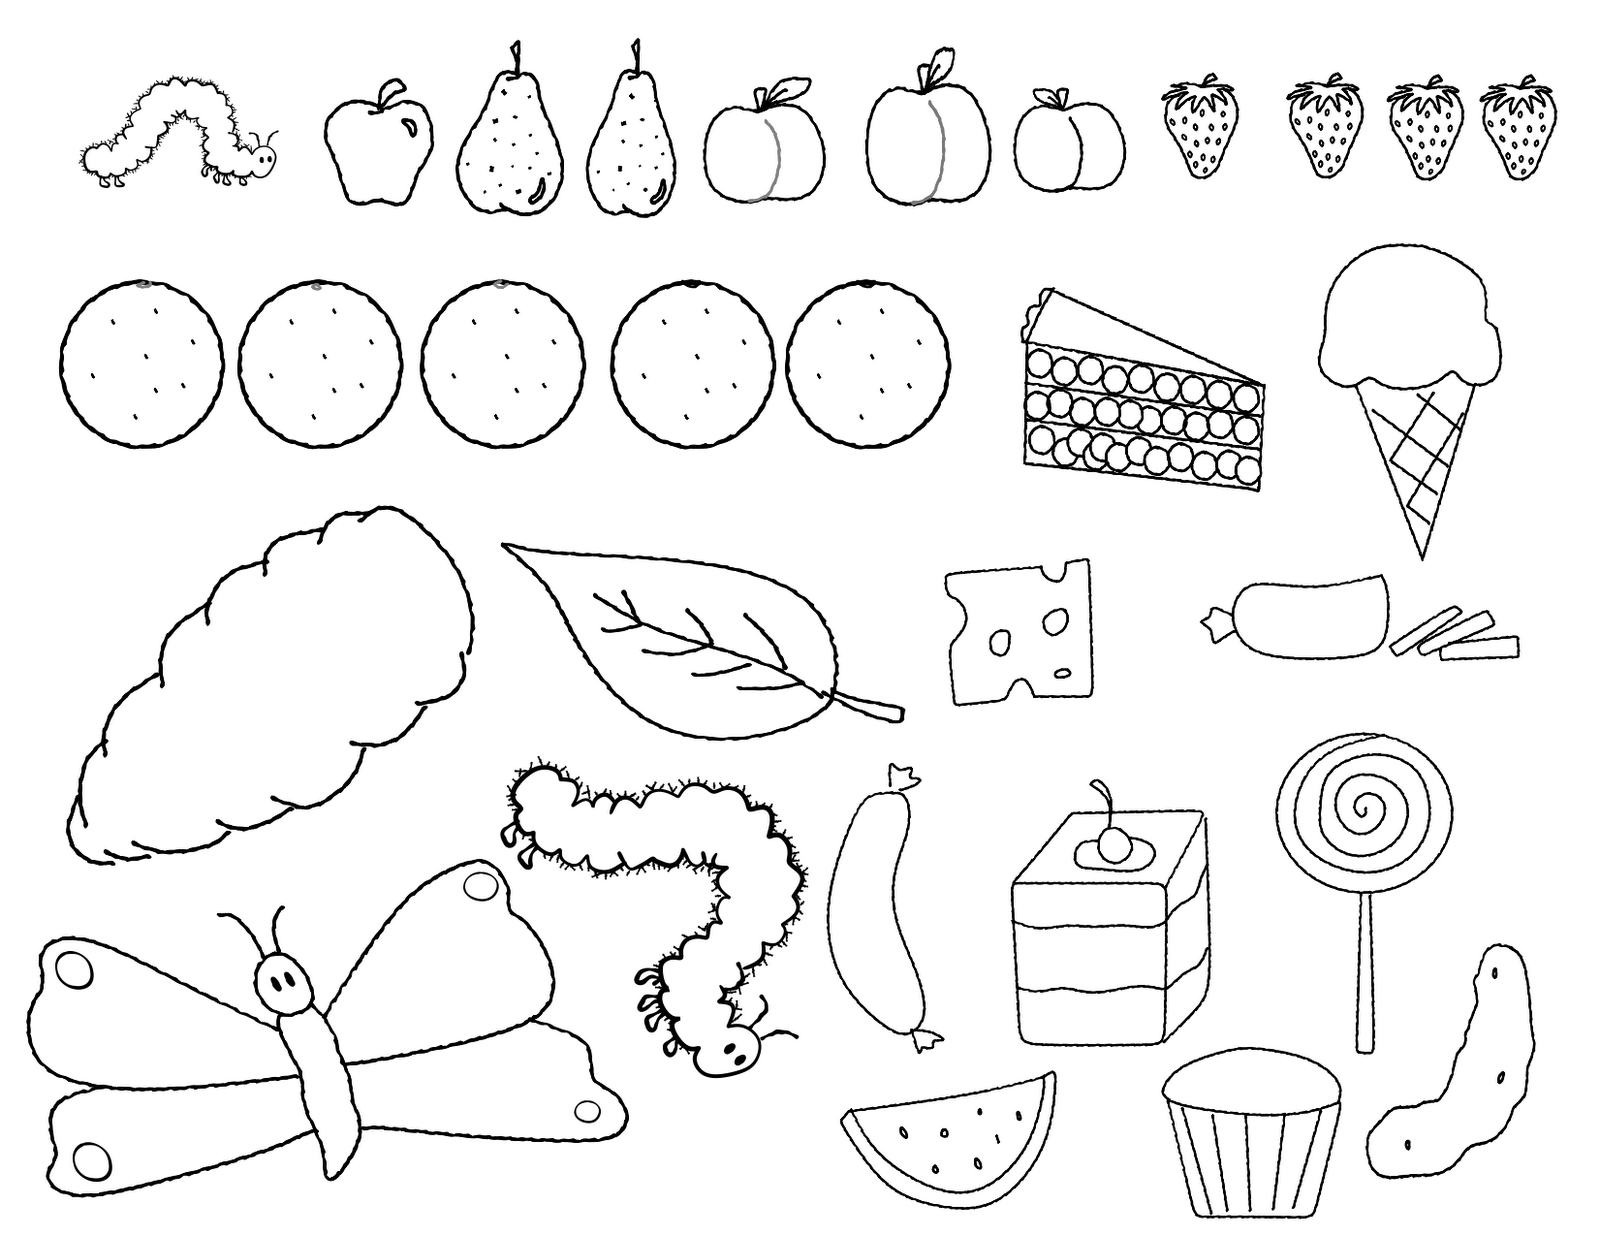 Hungry Caterpillar Drawing at GetDrawings.com.